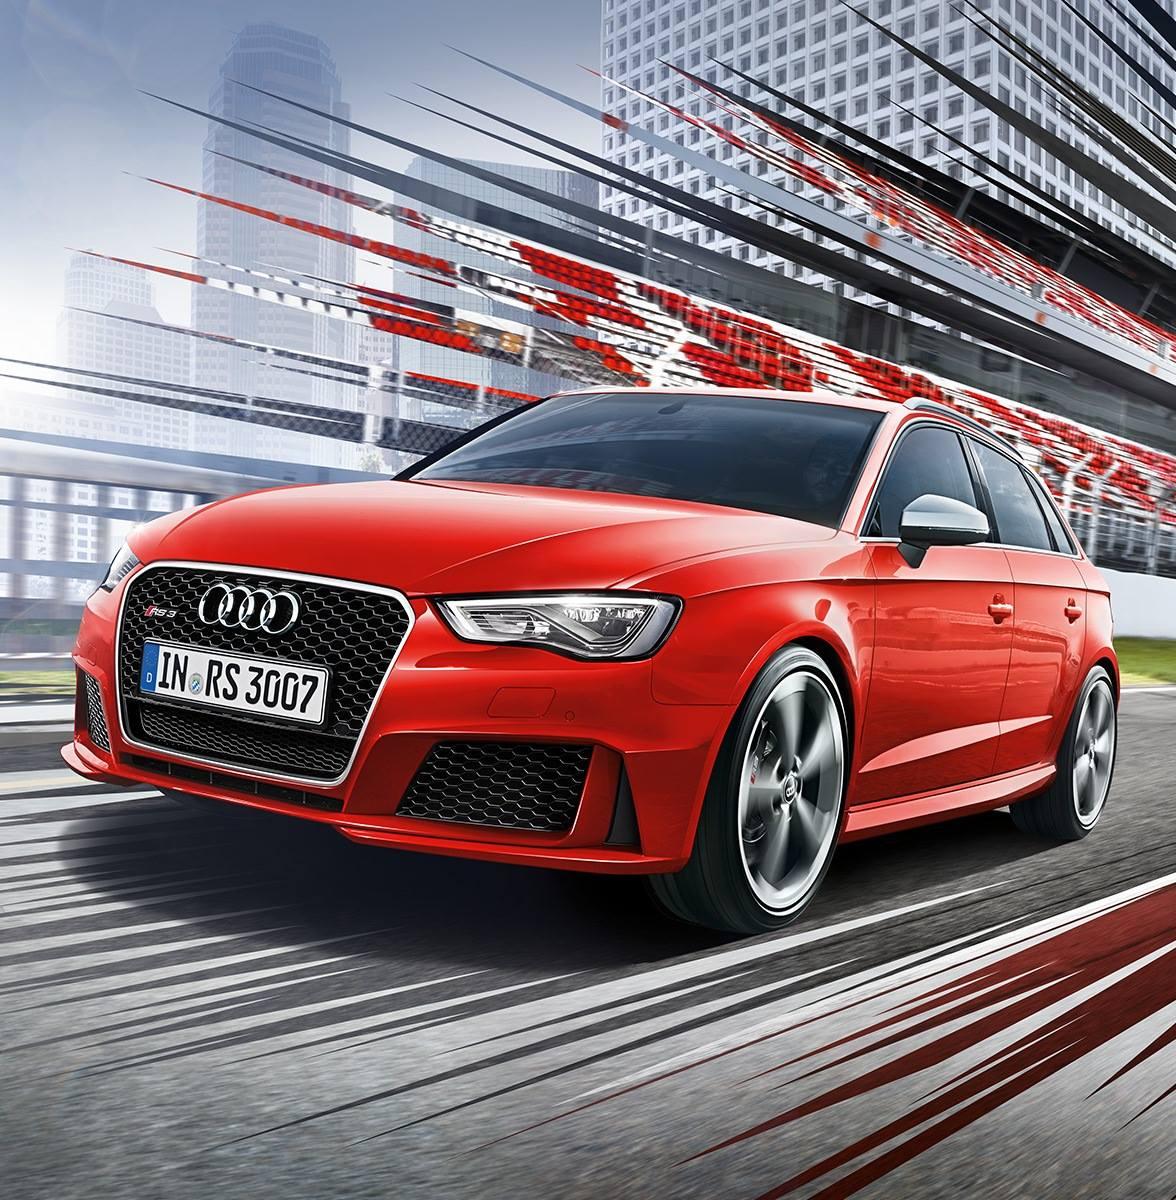 Фото | Новая Audi RS3 Sportback. 2015 год